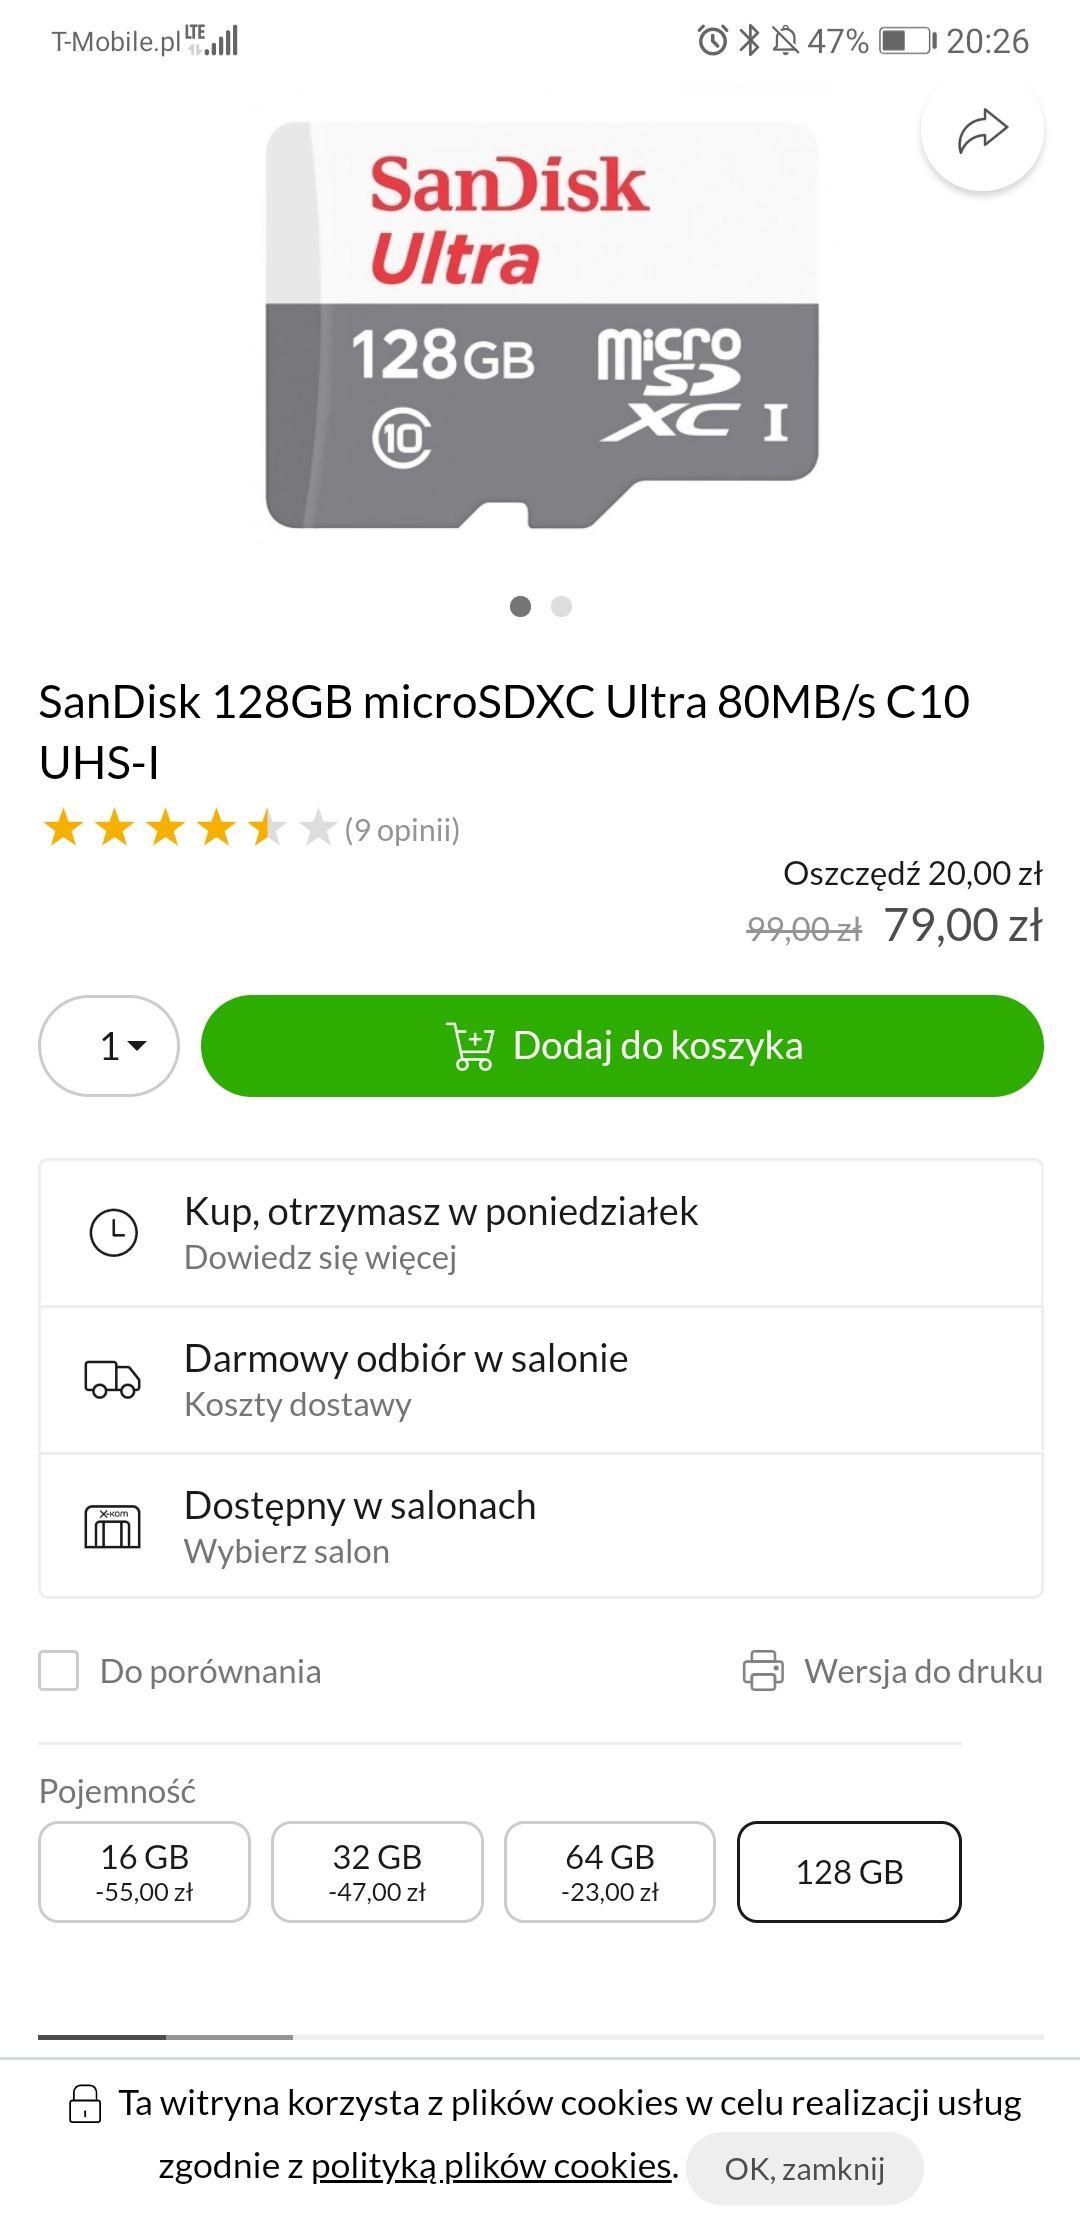 Karta SanDisk 128GB microSDXC Ultra 80MB/s C10 UHS-I